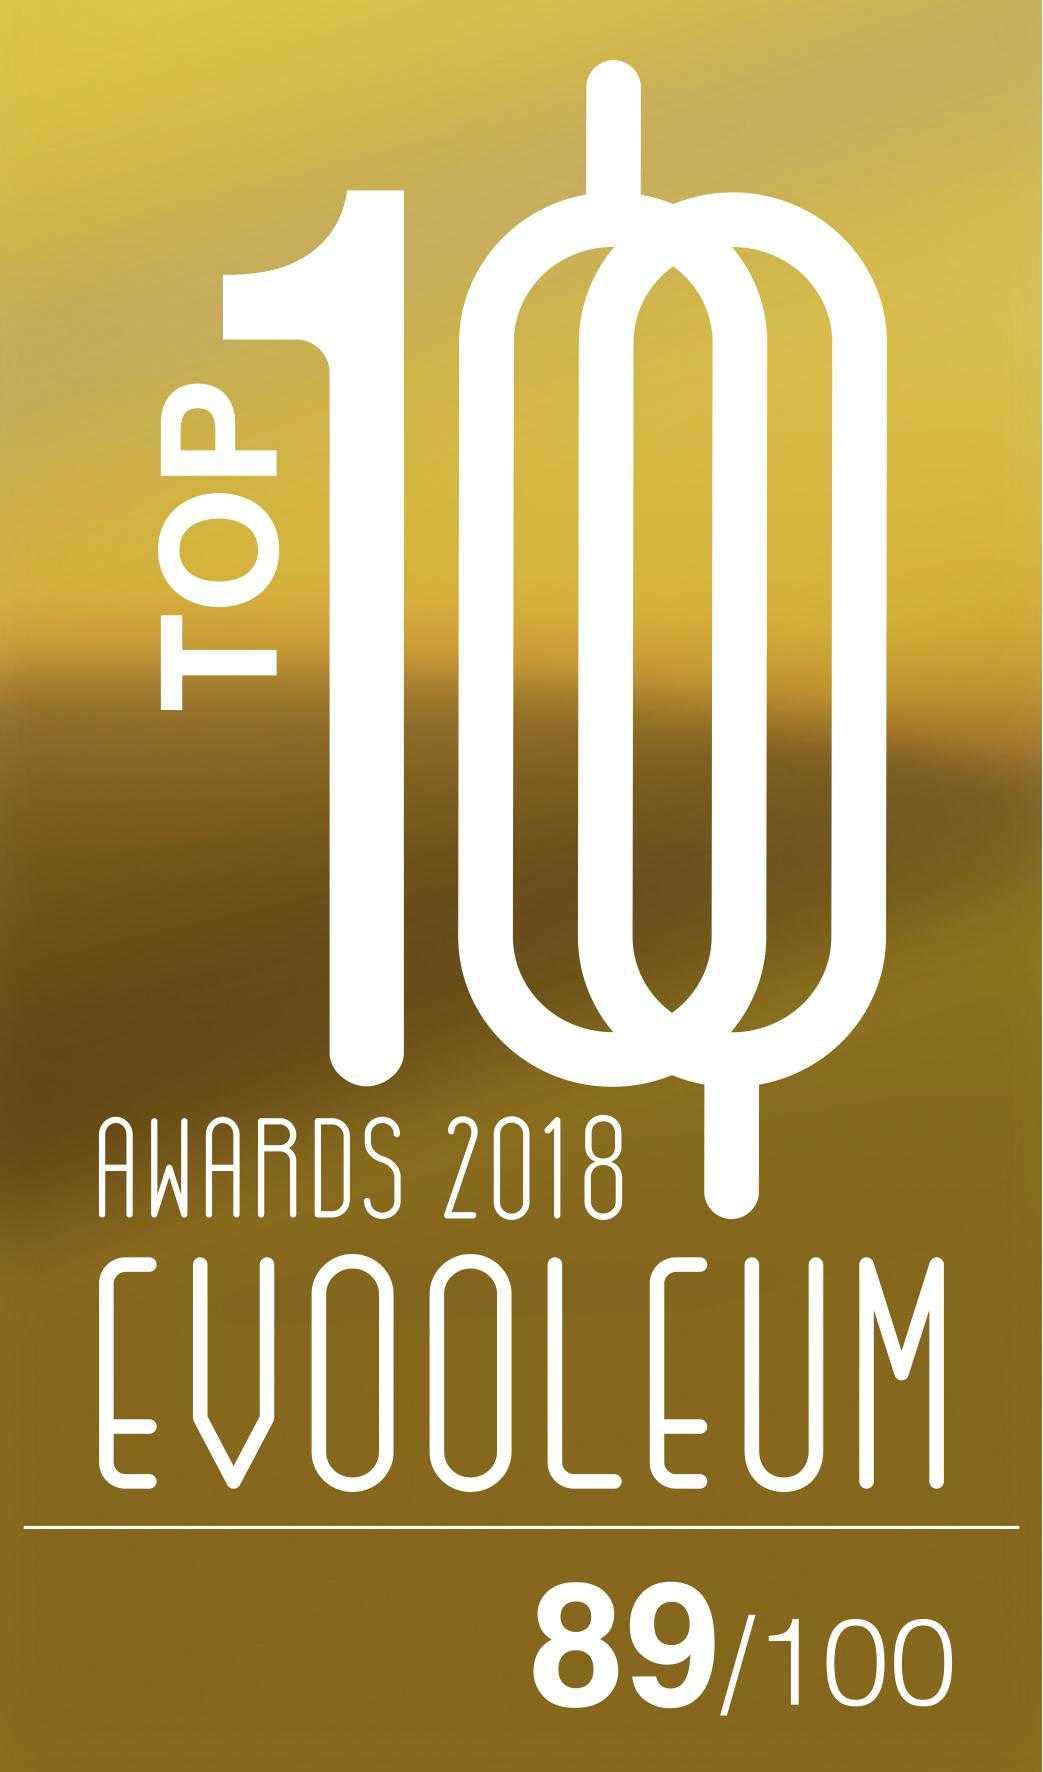 Awards-EVOOLEUM